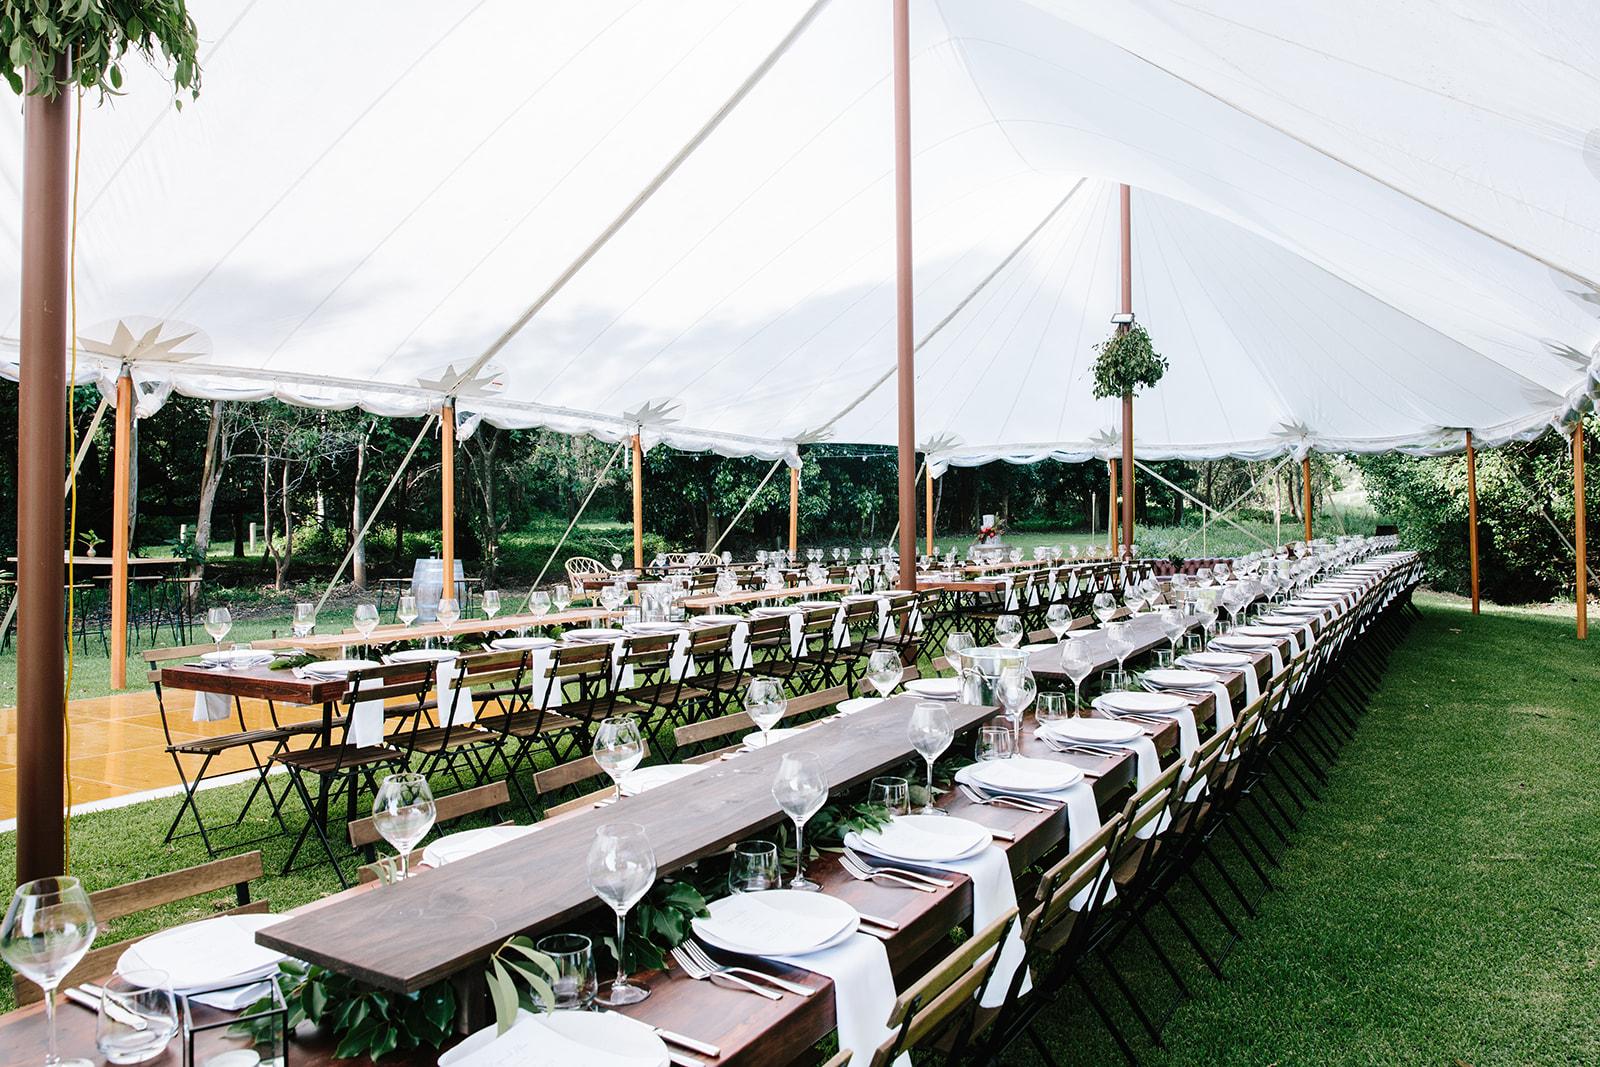 megan-adam-wedding-camilla-kirk-photography-highres-354.jpg